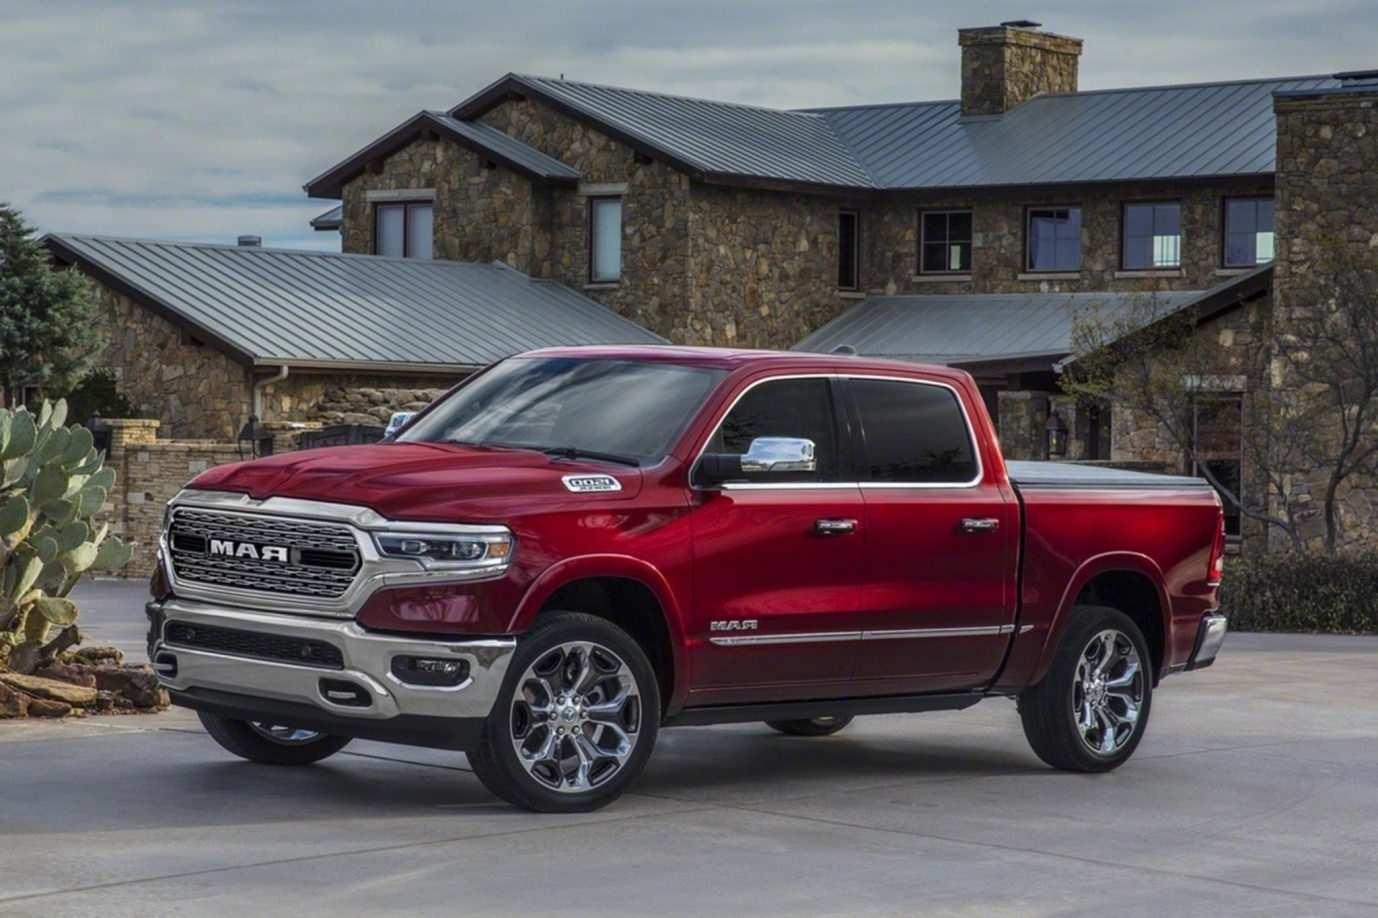 76 Great 2019 Dodge Dakota Interior by 2019 Dodge Dakota